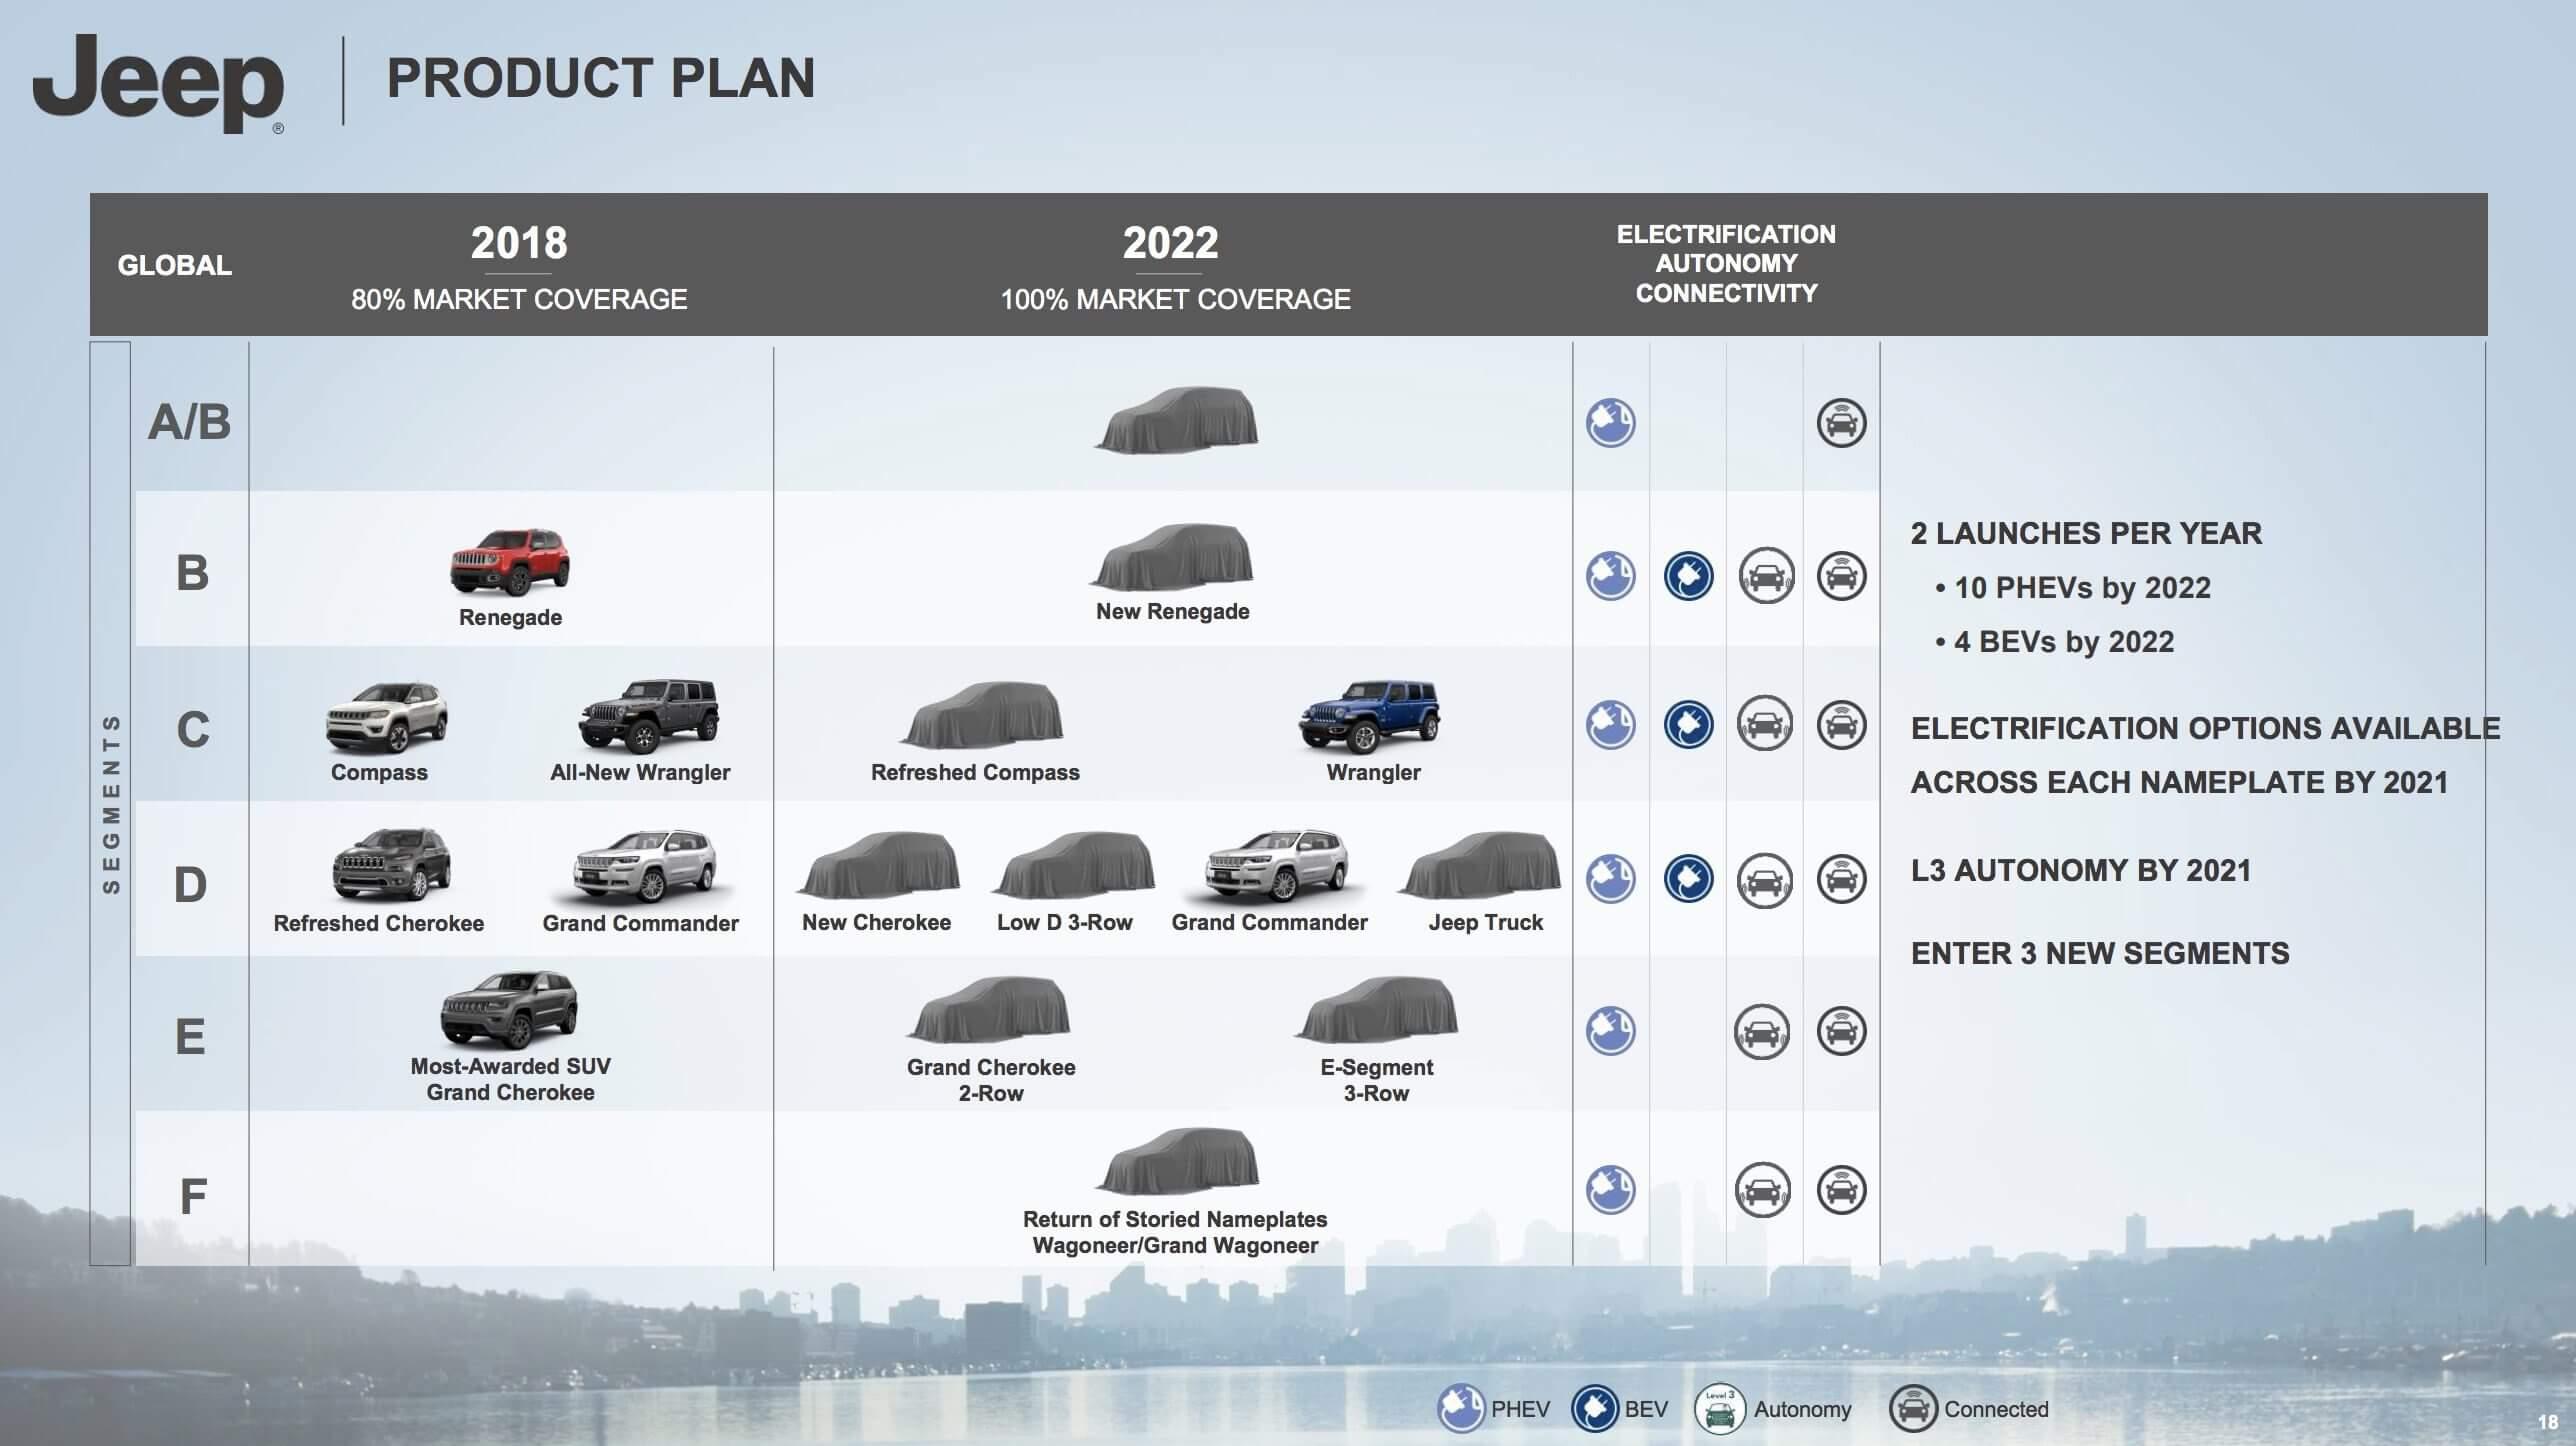 Дорожная карта Jeep на 2018-2022